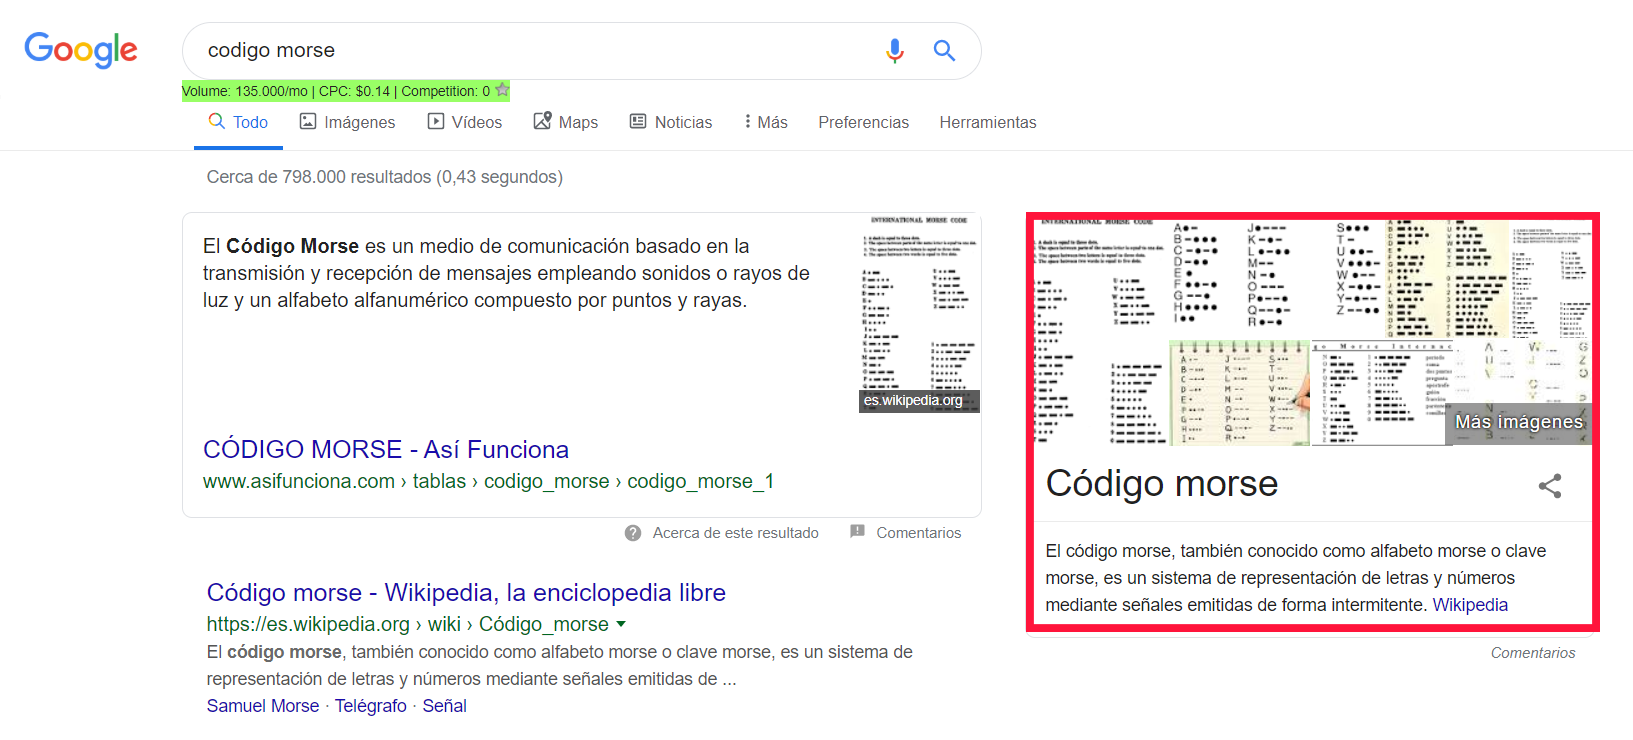 Paneles de exploracion generalmente de wikipedia